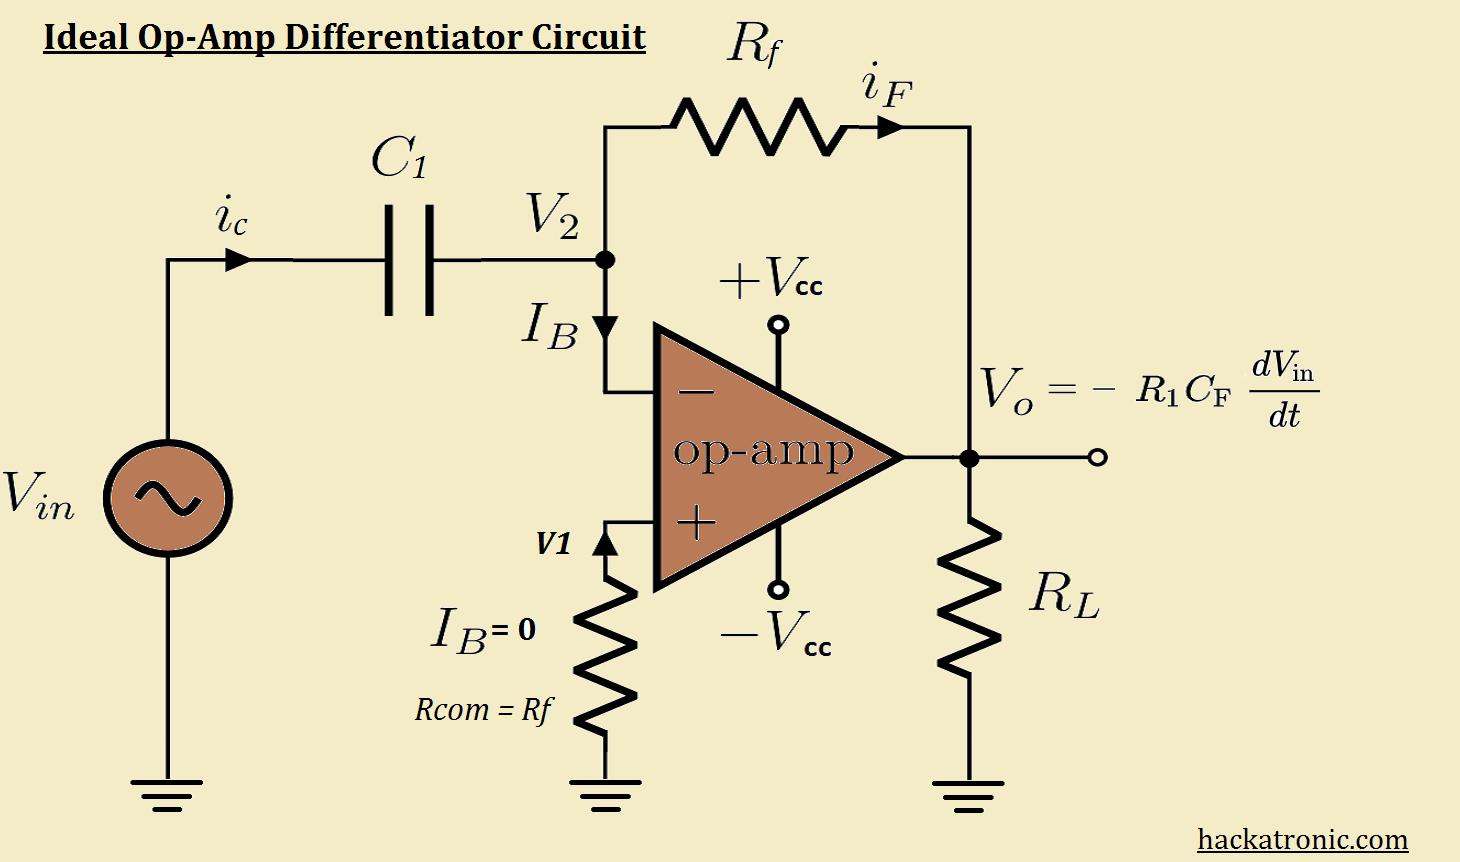 opamp differentiator circuit